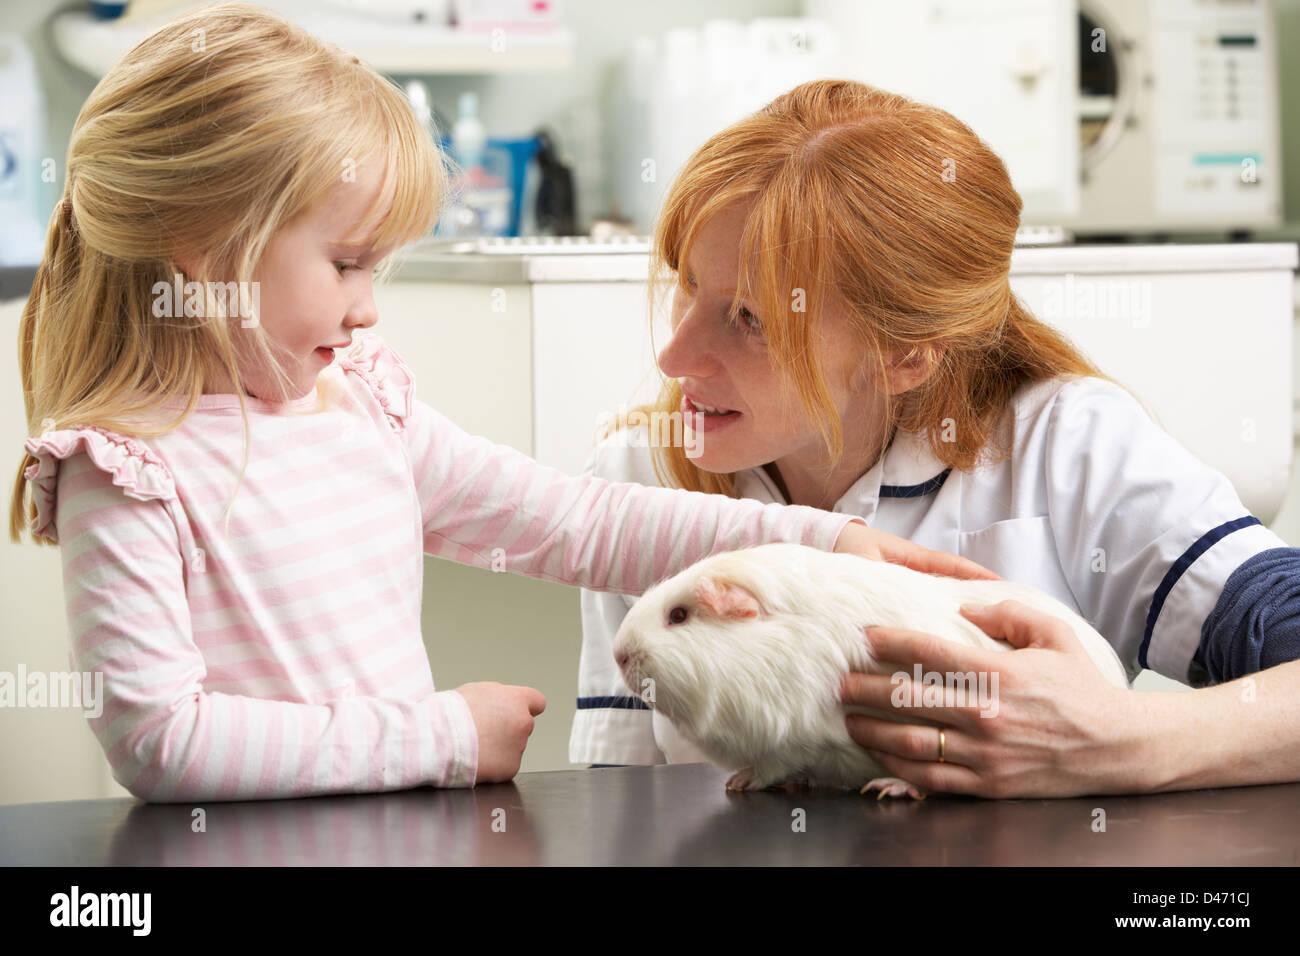 Female Veterinary Surgeon Examining Child's Guinea Pig In Surgery - Stock Image